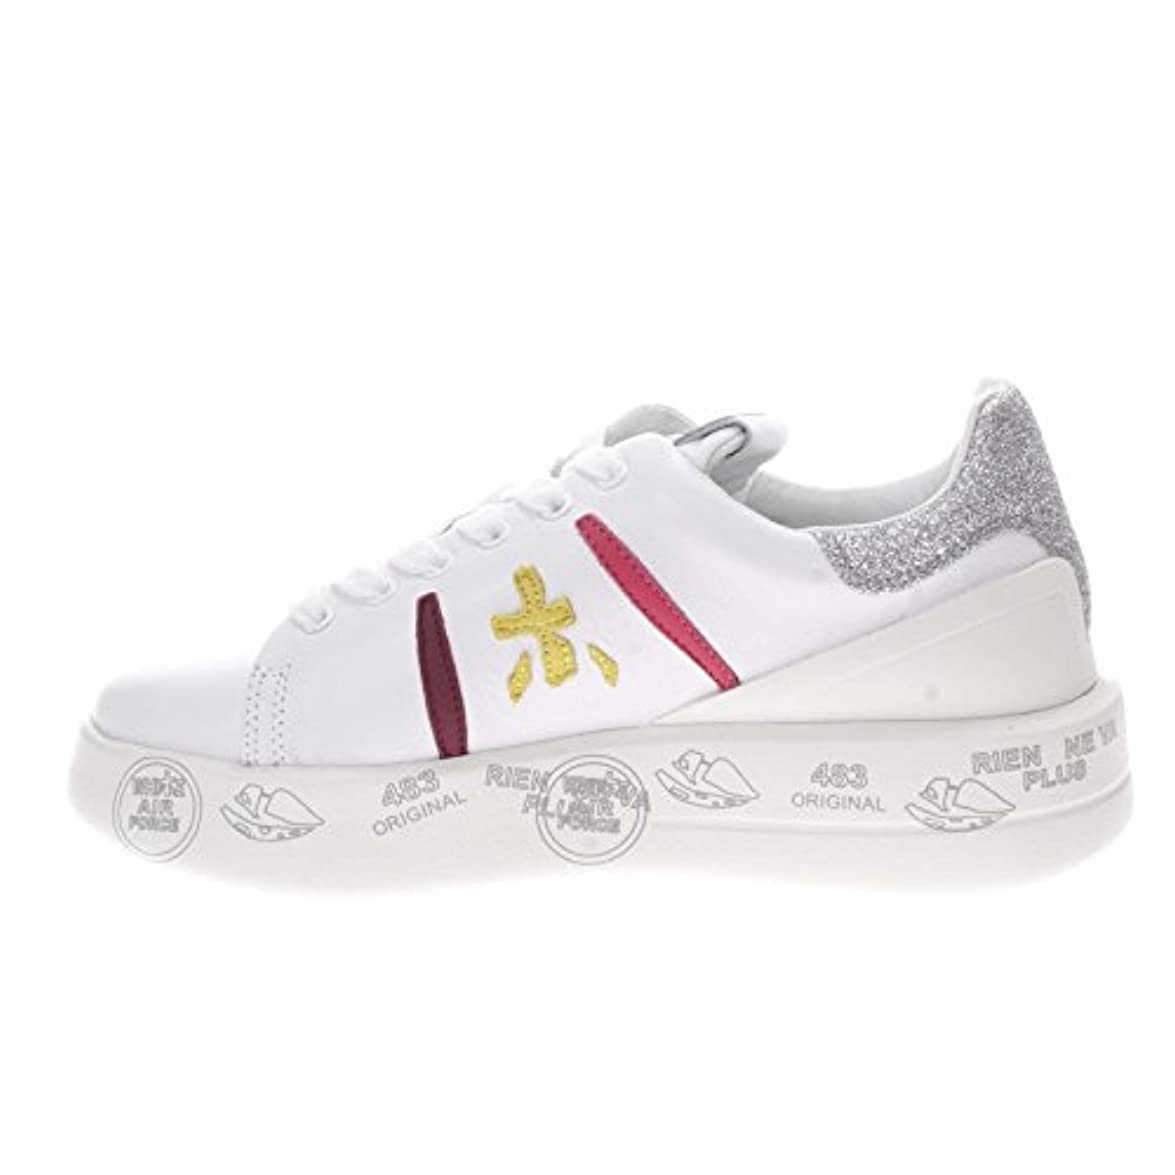 Premiata Belle Var 3141 sneaker In Pelle Donna bianco 39